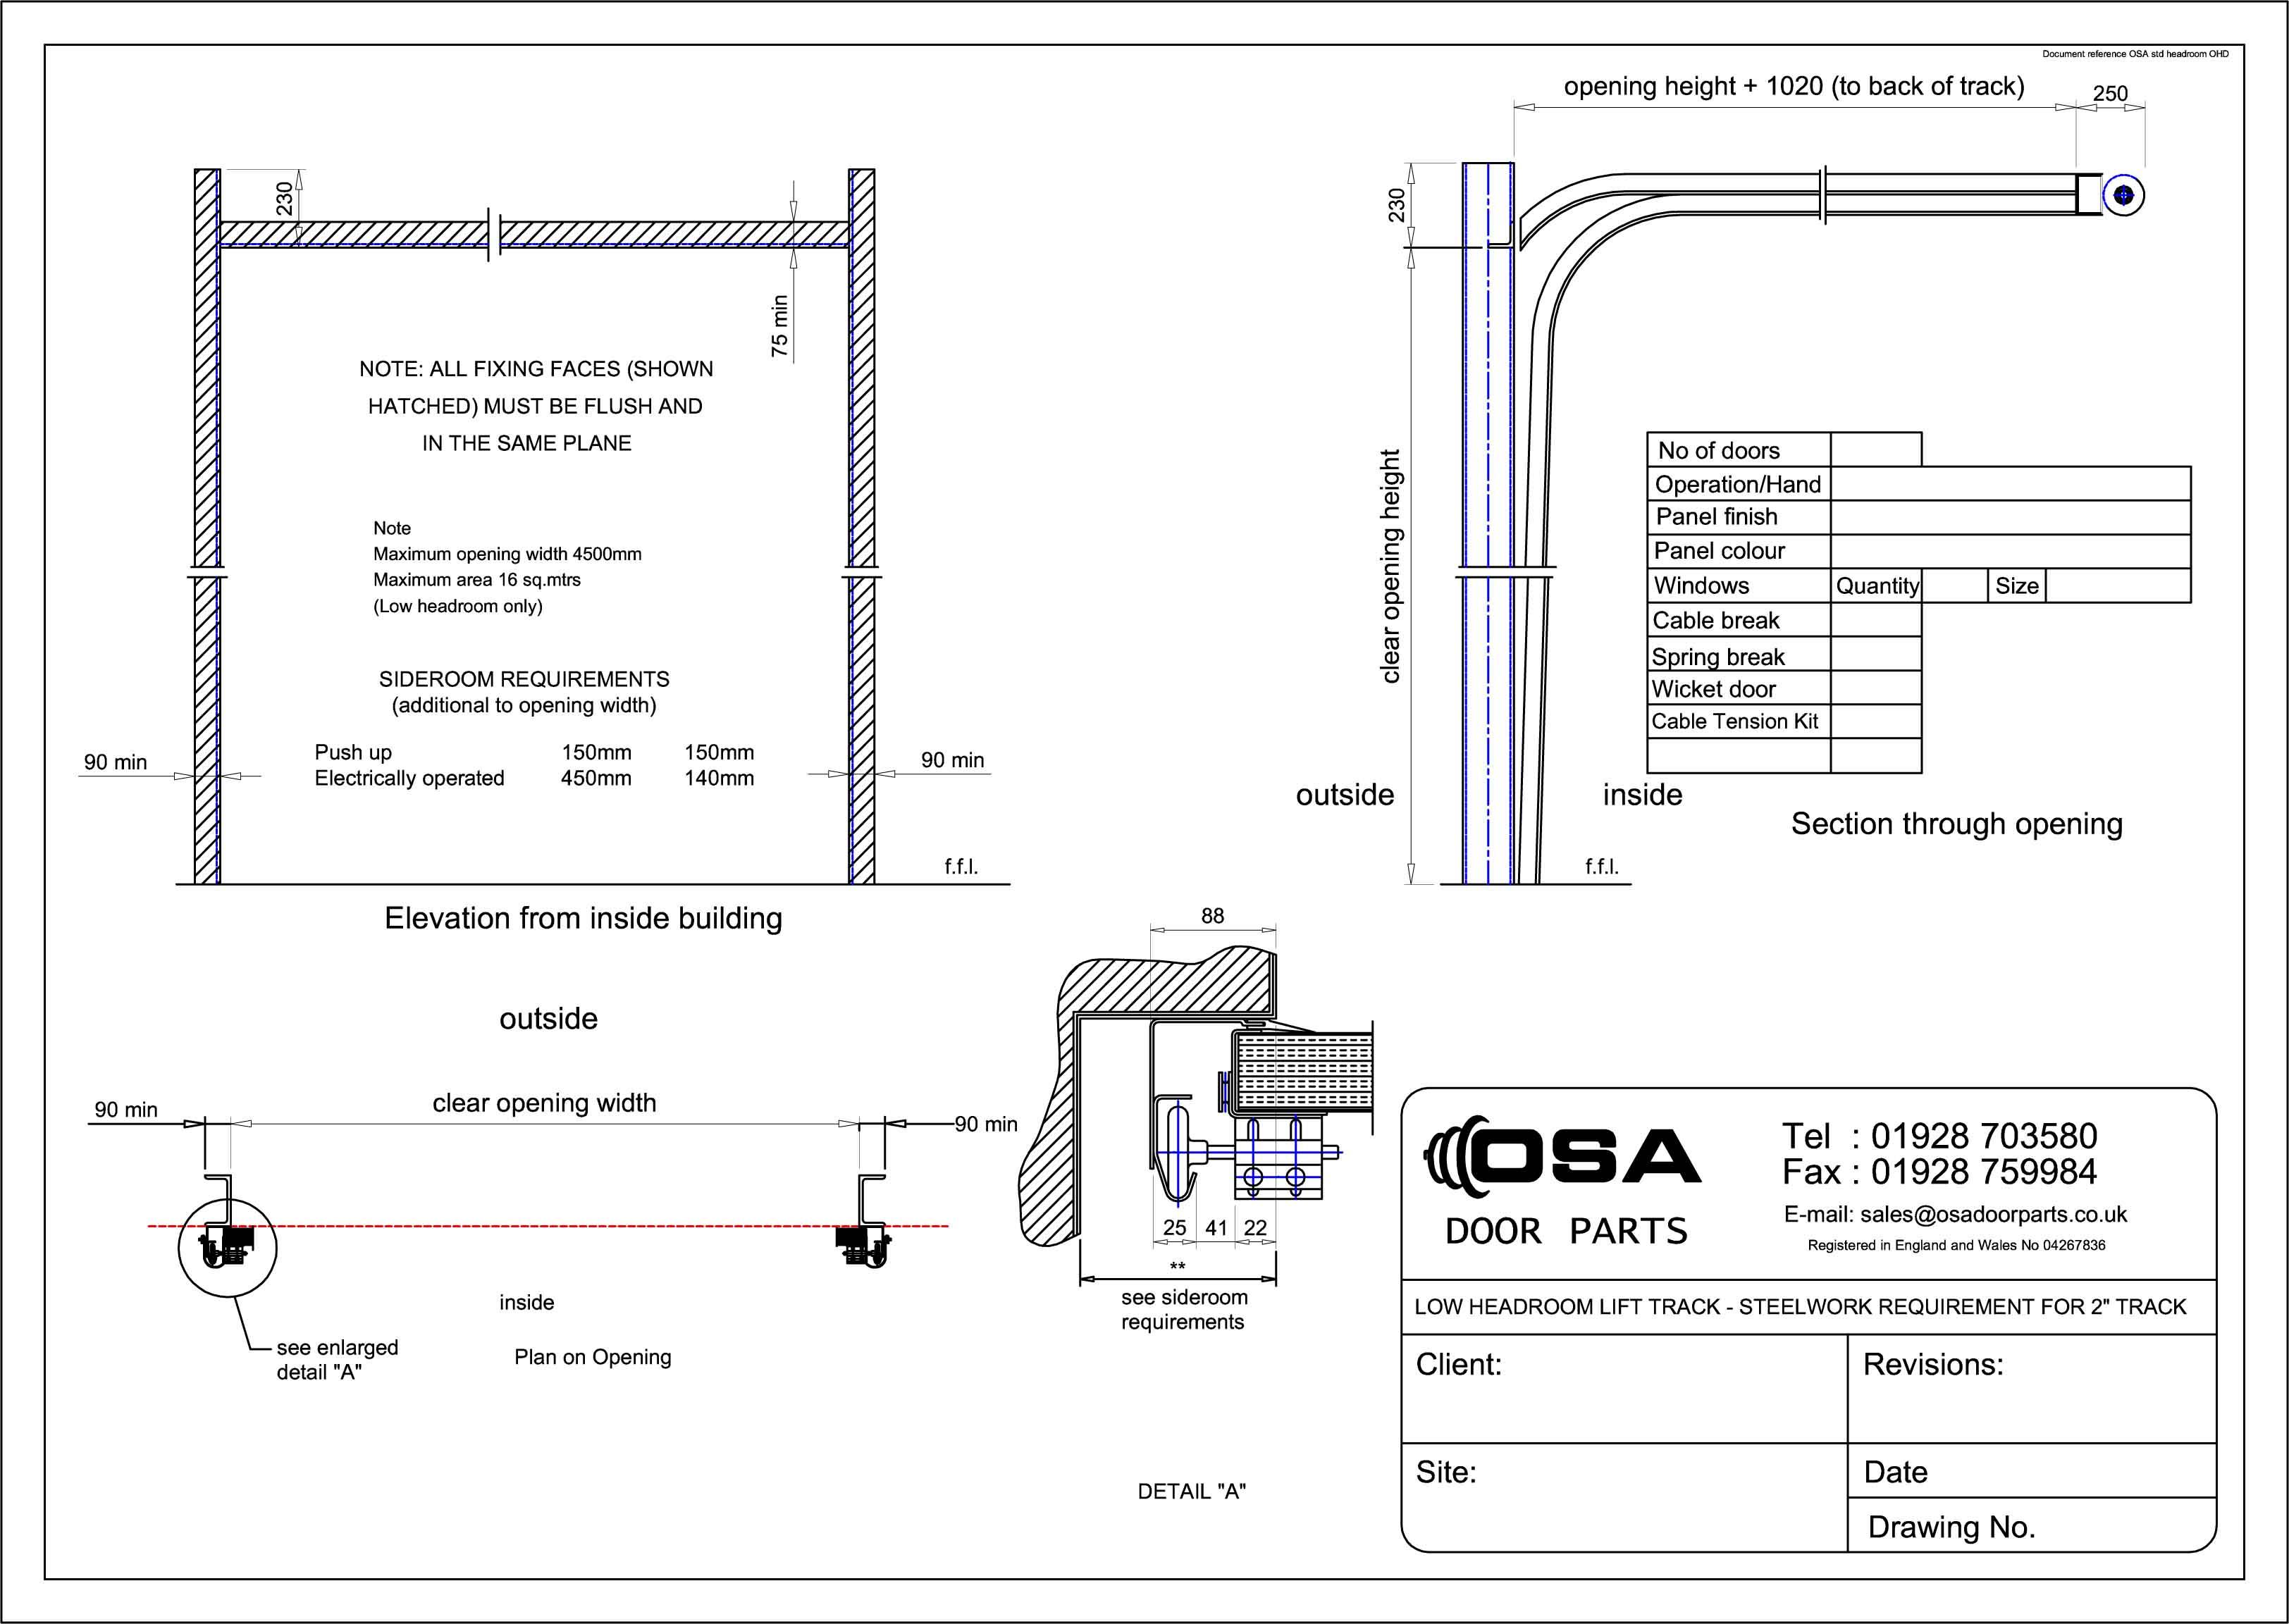 Sectional Garage Door Construction Details : Drawings for sectional overhead doors osa door parts limited